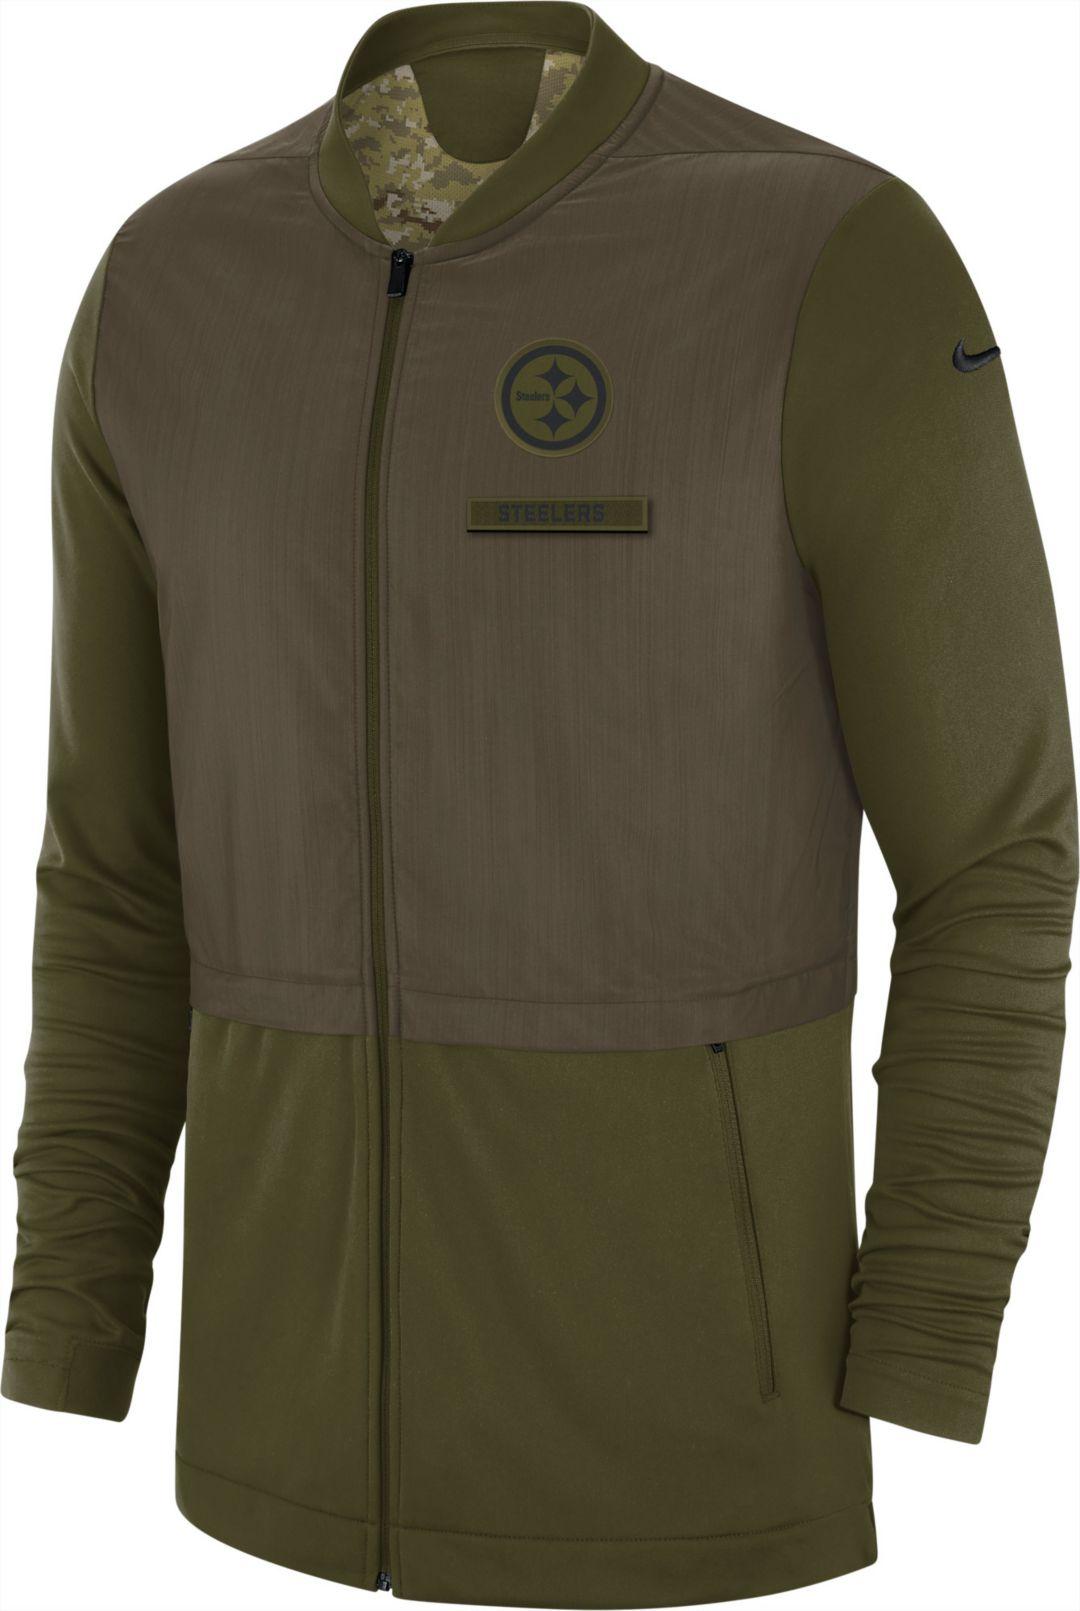 half off 59cbe 3917f Nike Men's Salute to Service Pittsburgh Steelers Hybrid Full-Zip Jacket